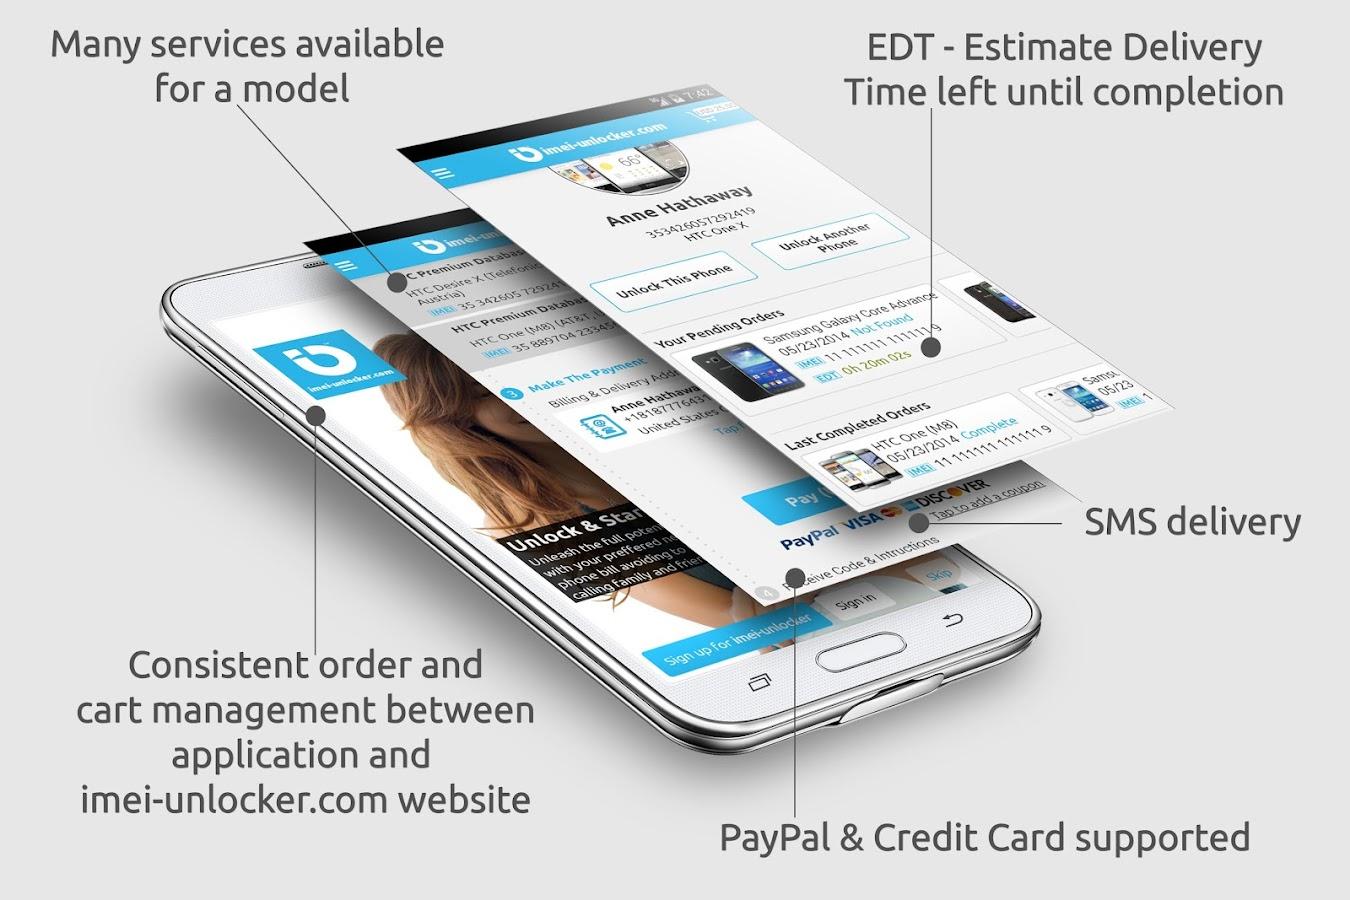 imei-unlocker | Network unlock 2 1 0 APK Download - Android Tools Apps